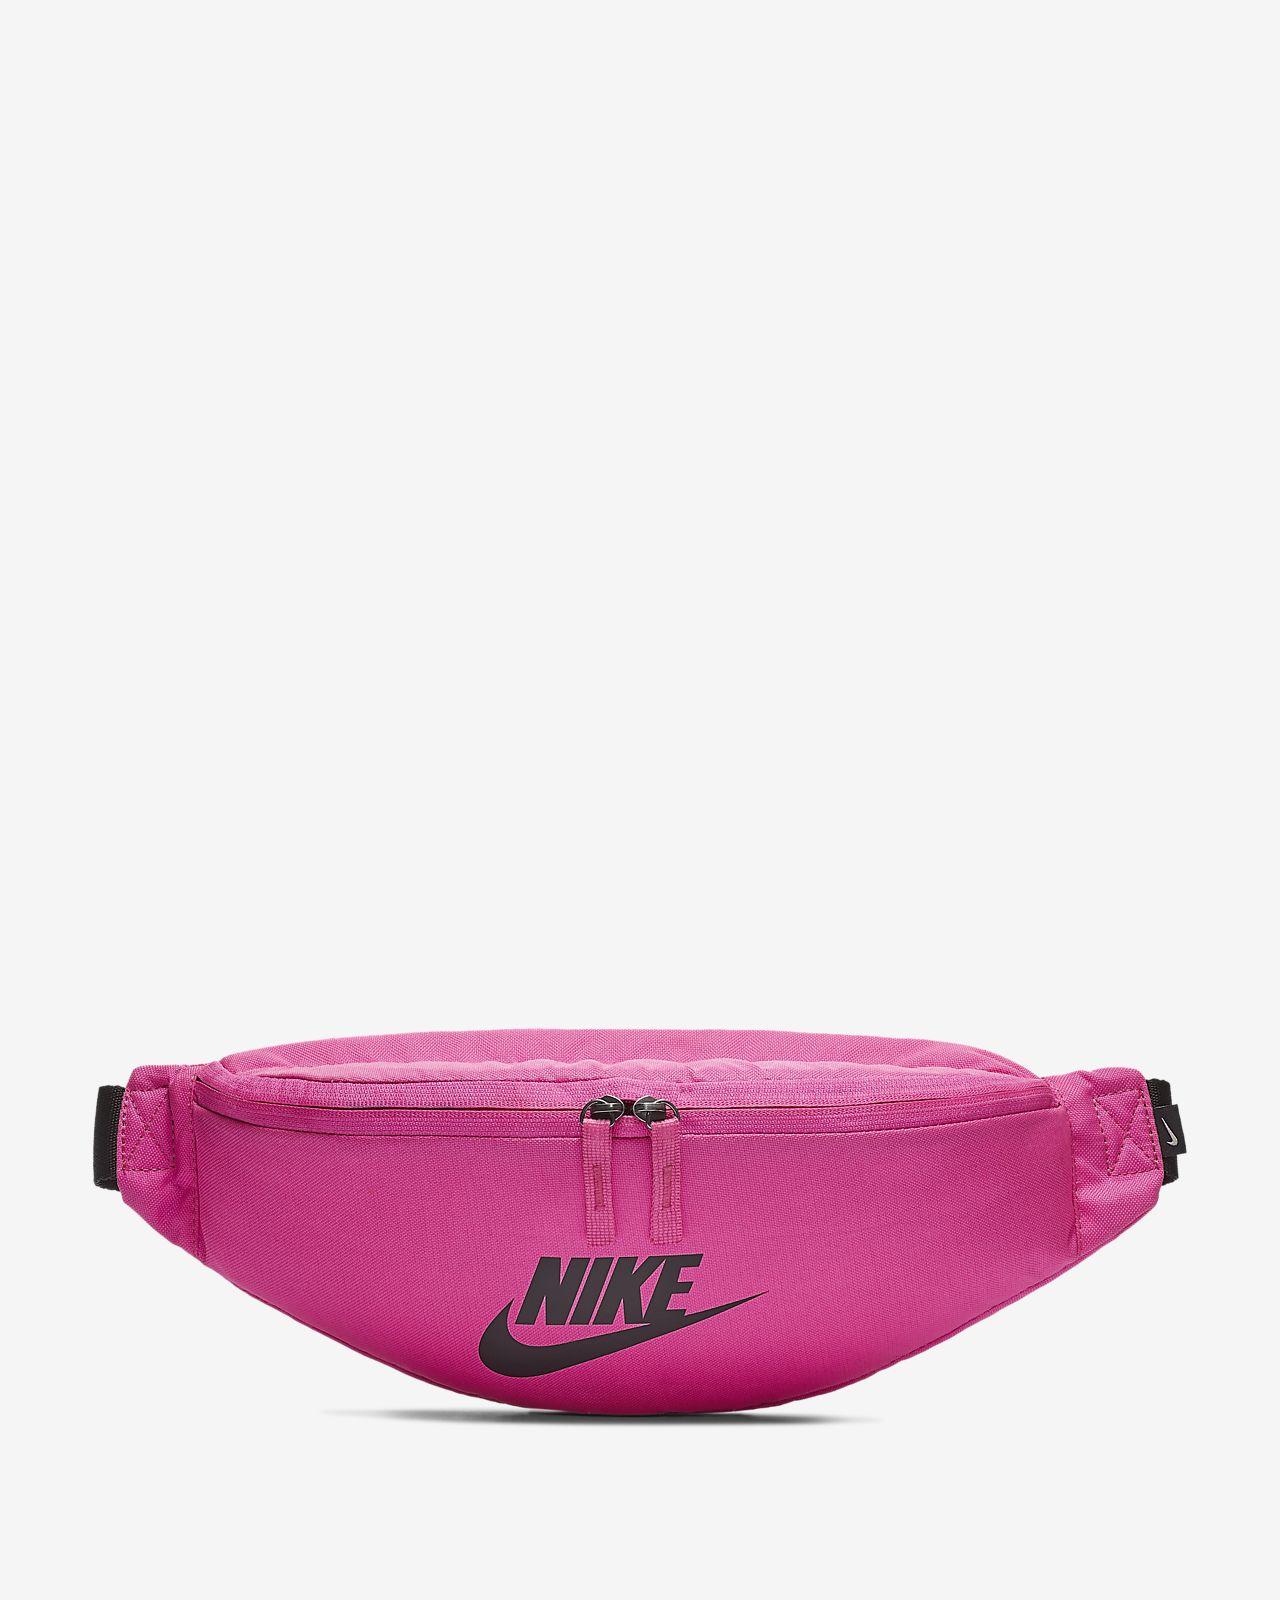 e3ceb2edc3e21a Nike Sportswear Heritage Fanny Pack. Nike.com